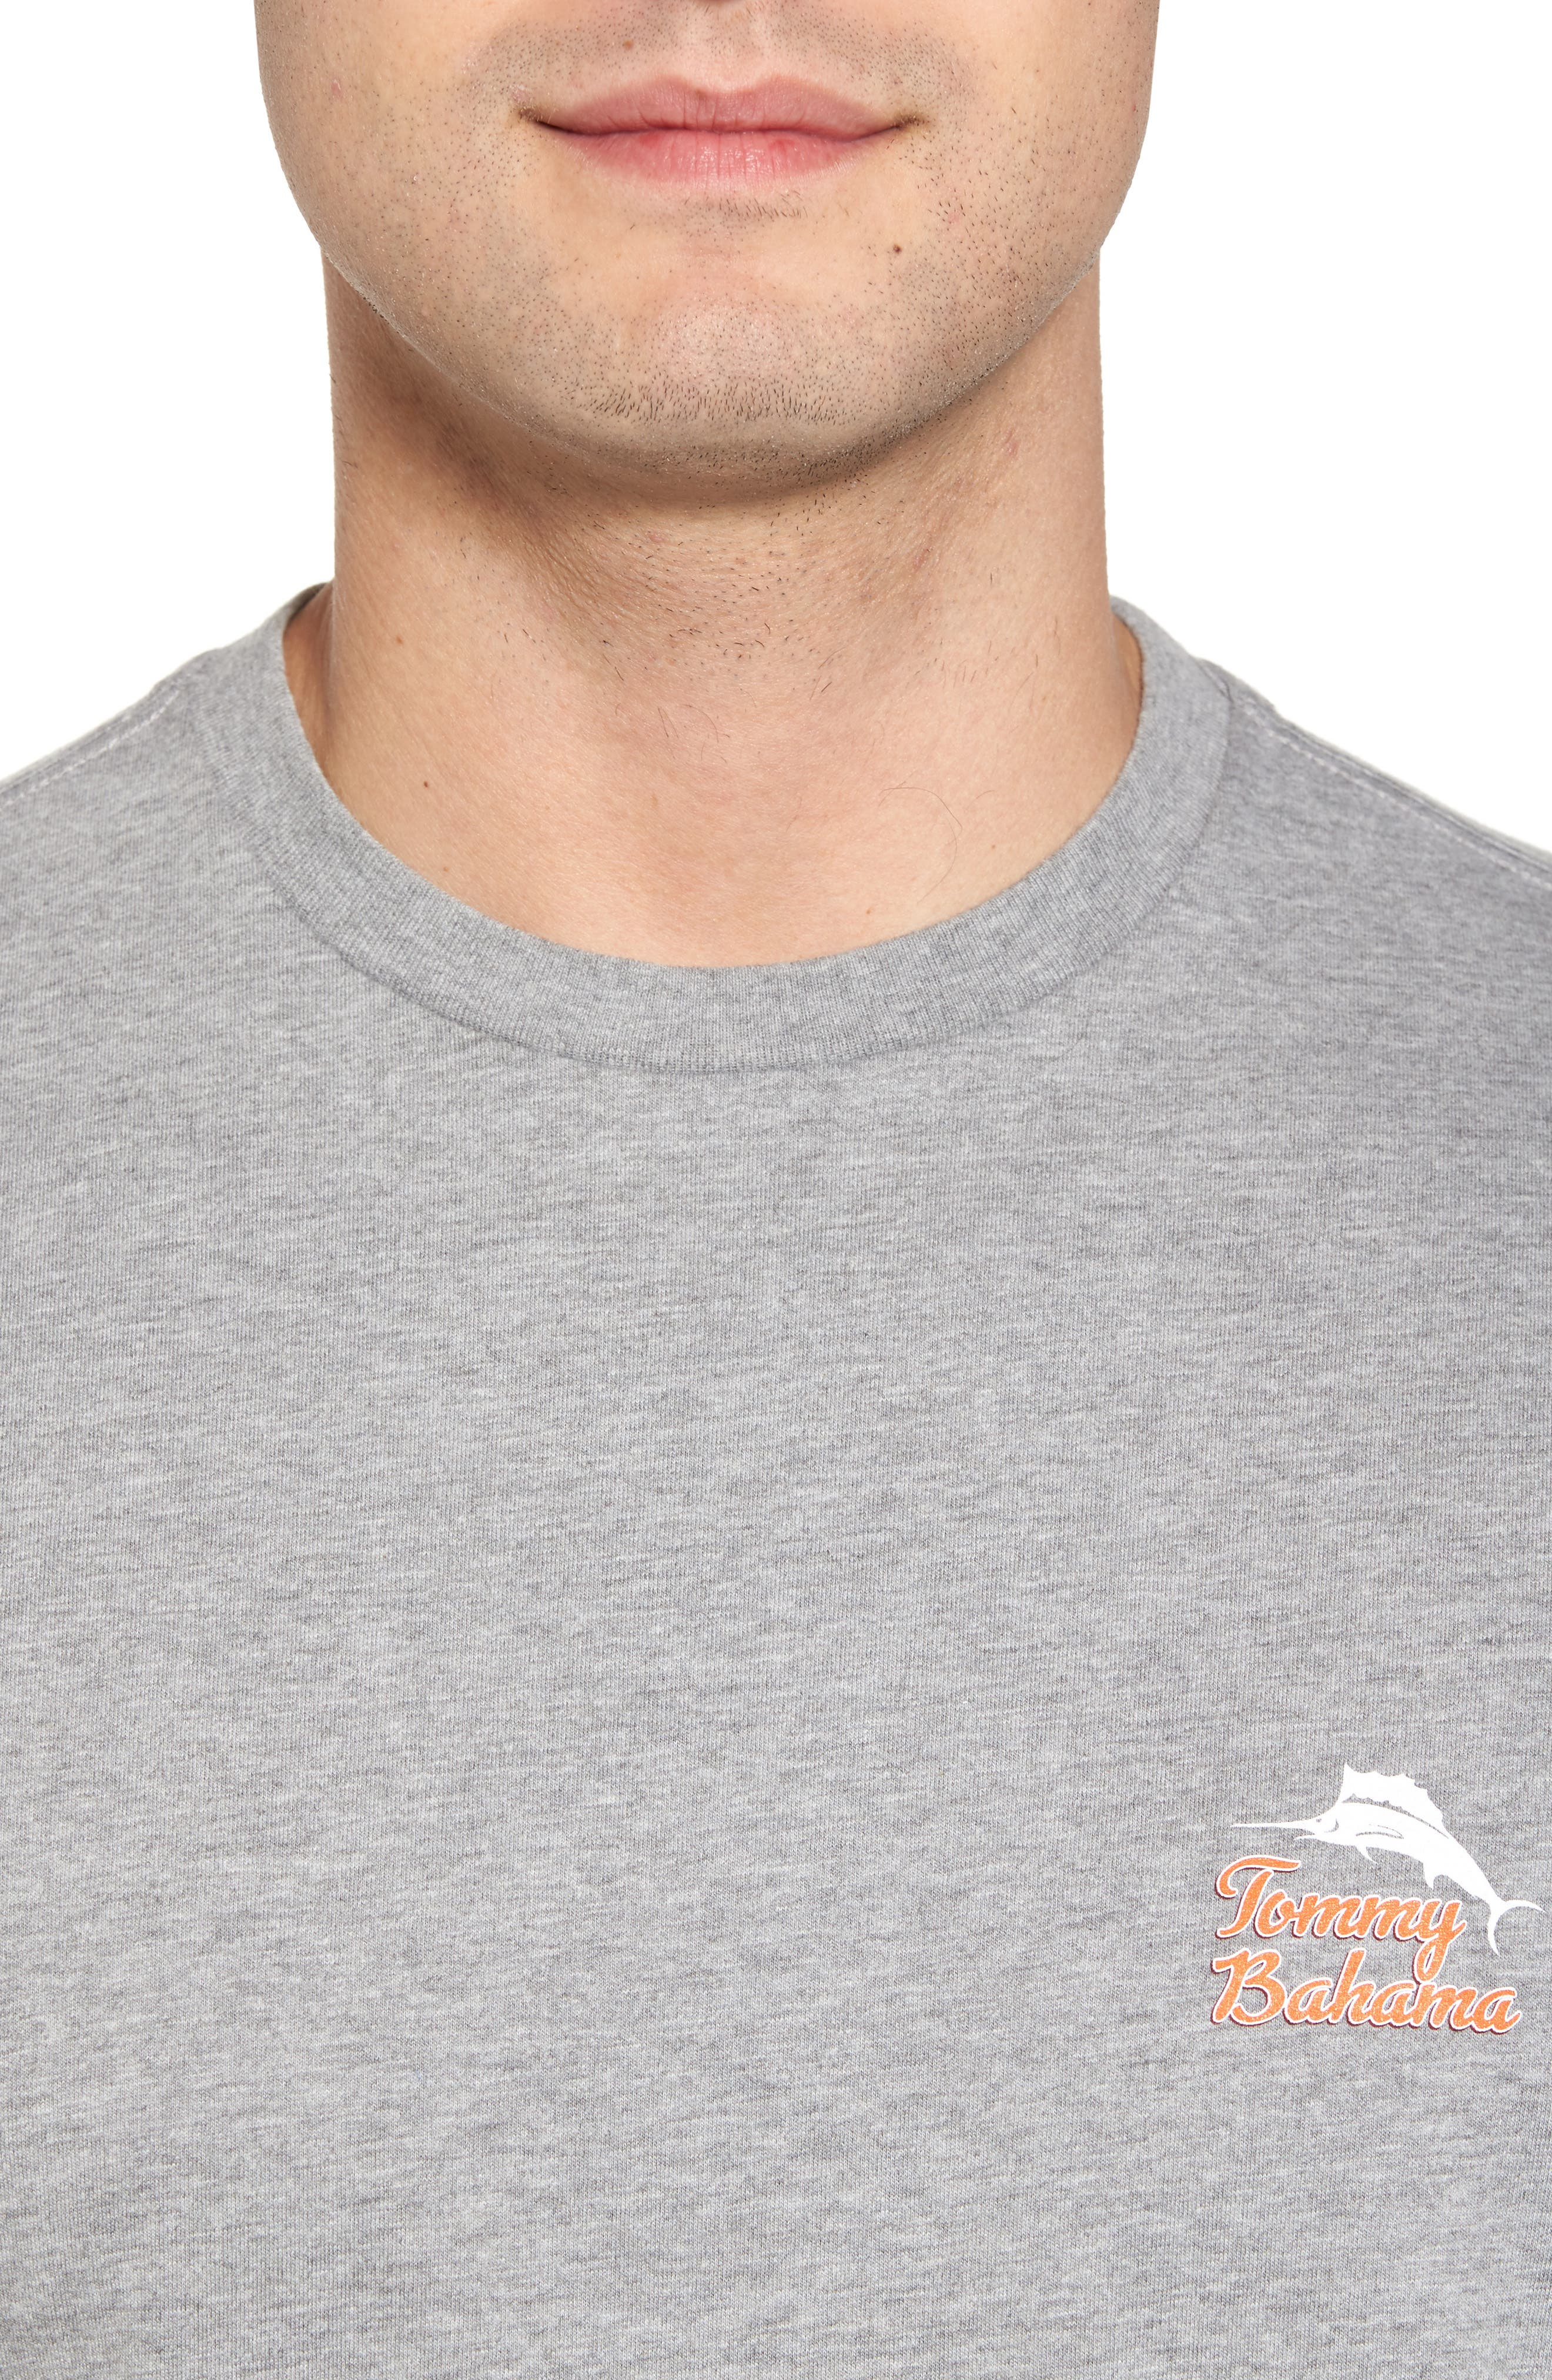 Morning Anchor Graphic T-Shirt,                             Alternate thumbnail 4, color,                             020